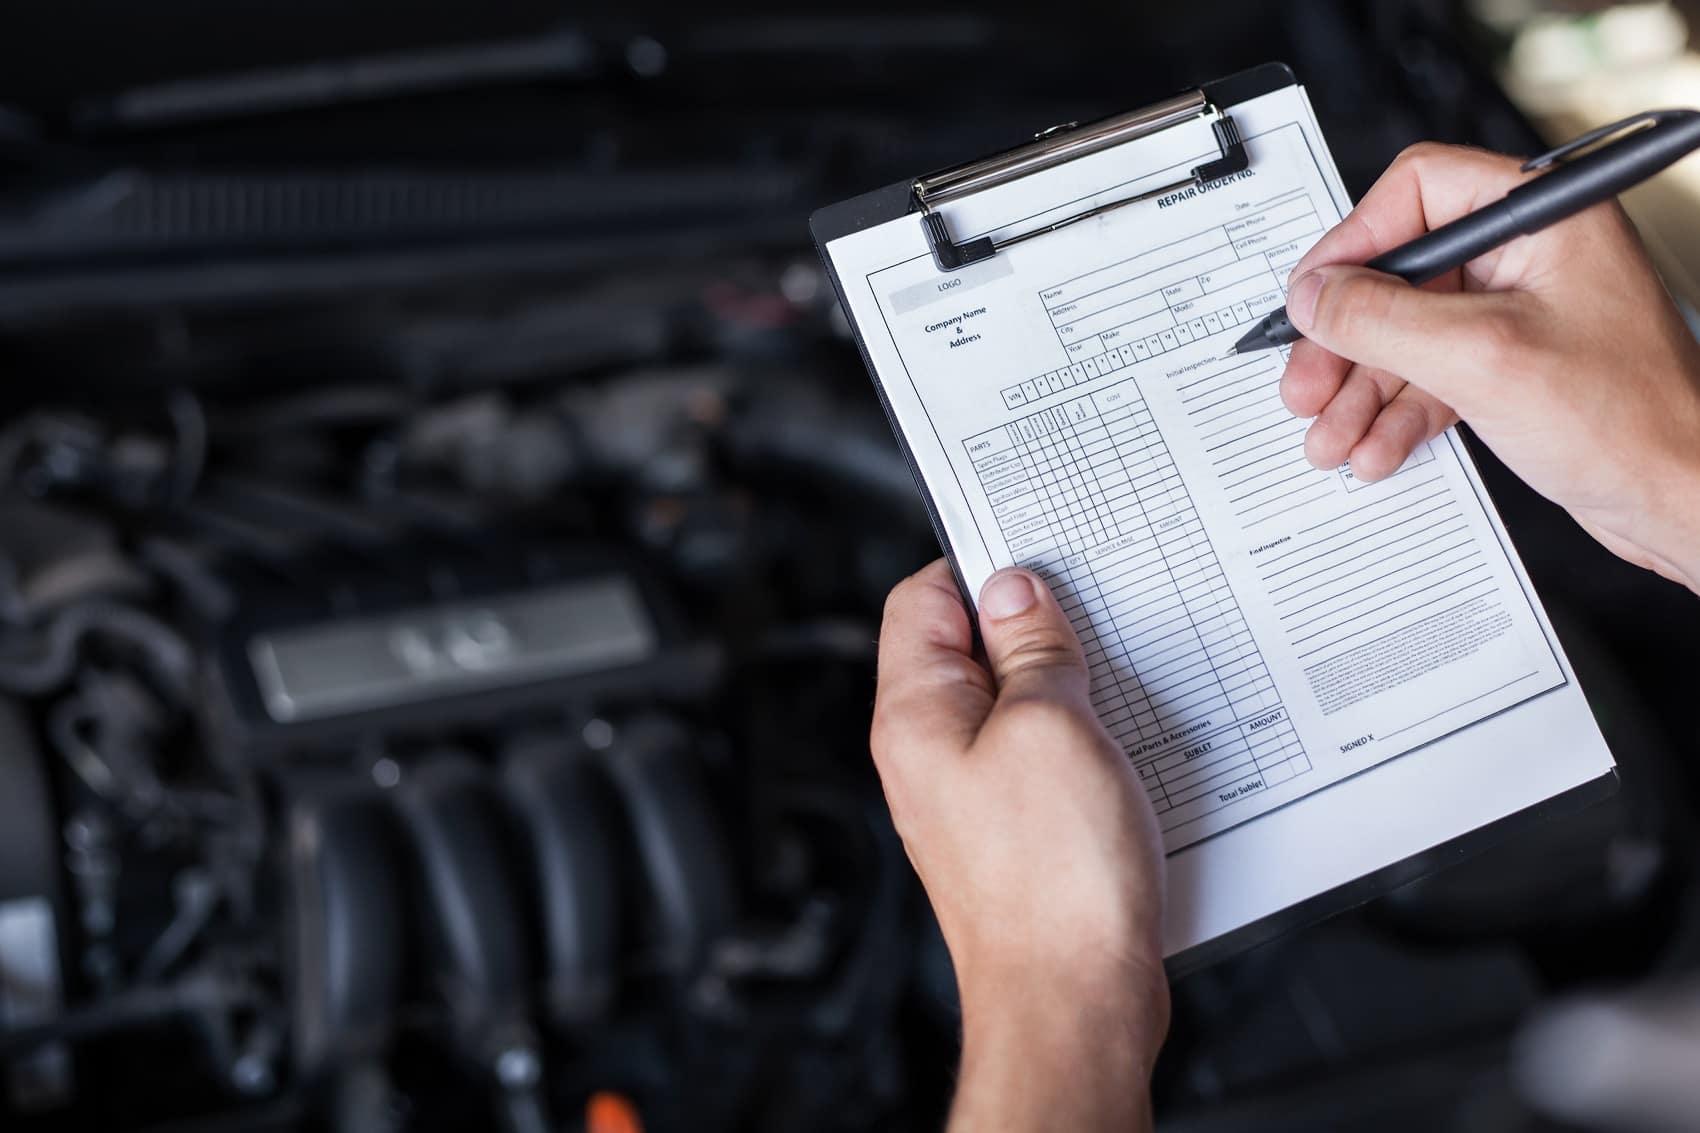 Prepare Your Car for Trade-In